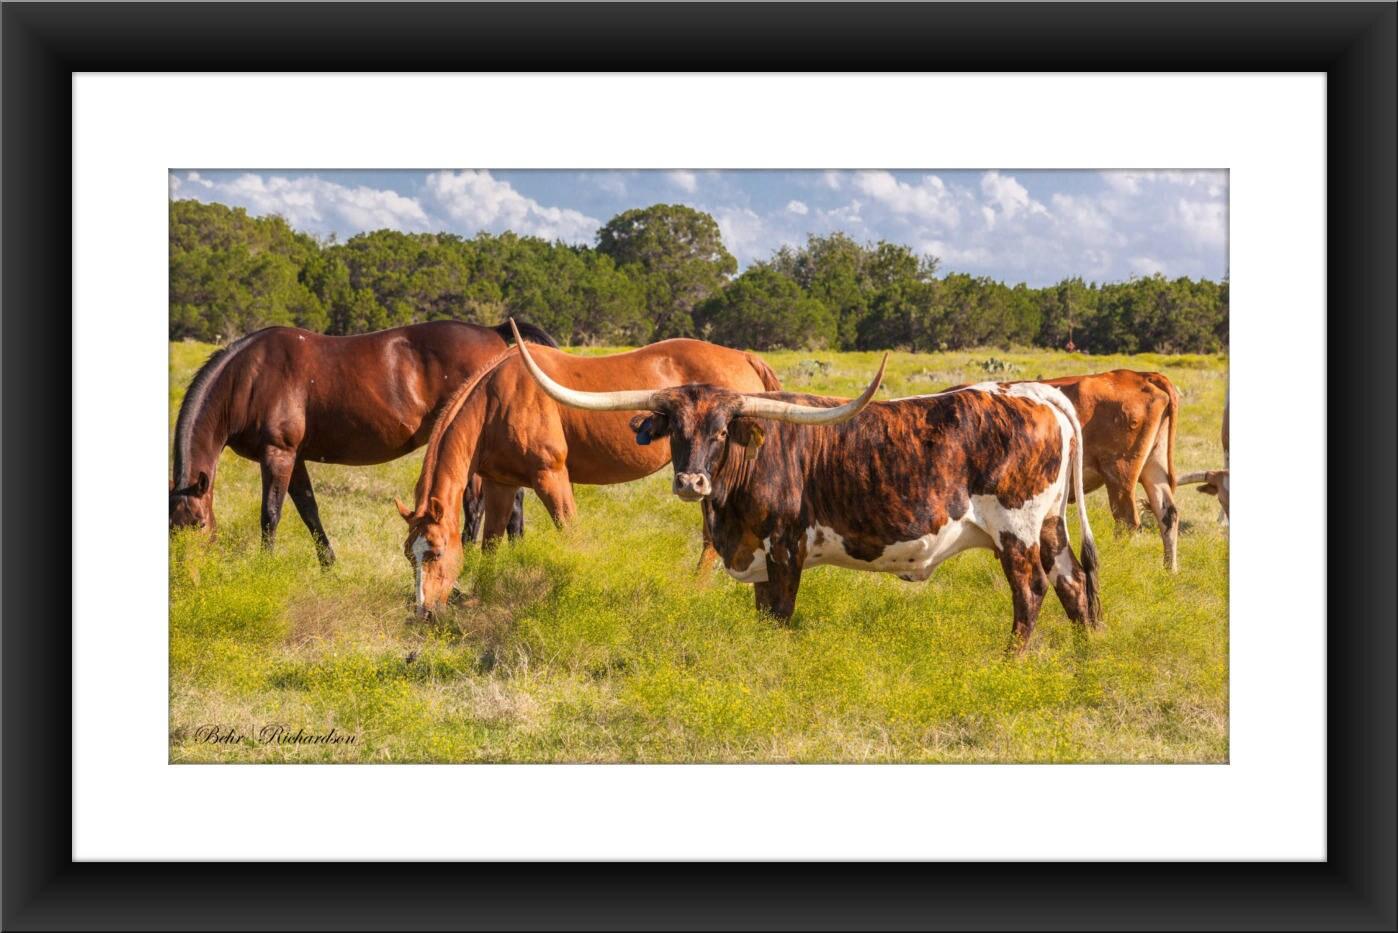 A Fine Art Print of Texas Longhorn and Horses Longhorn